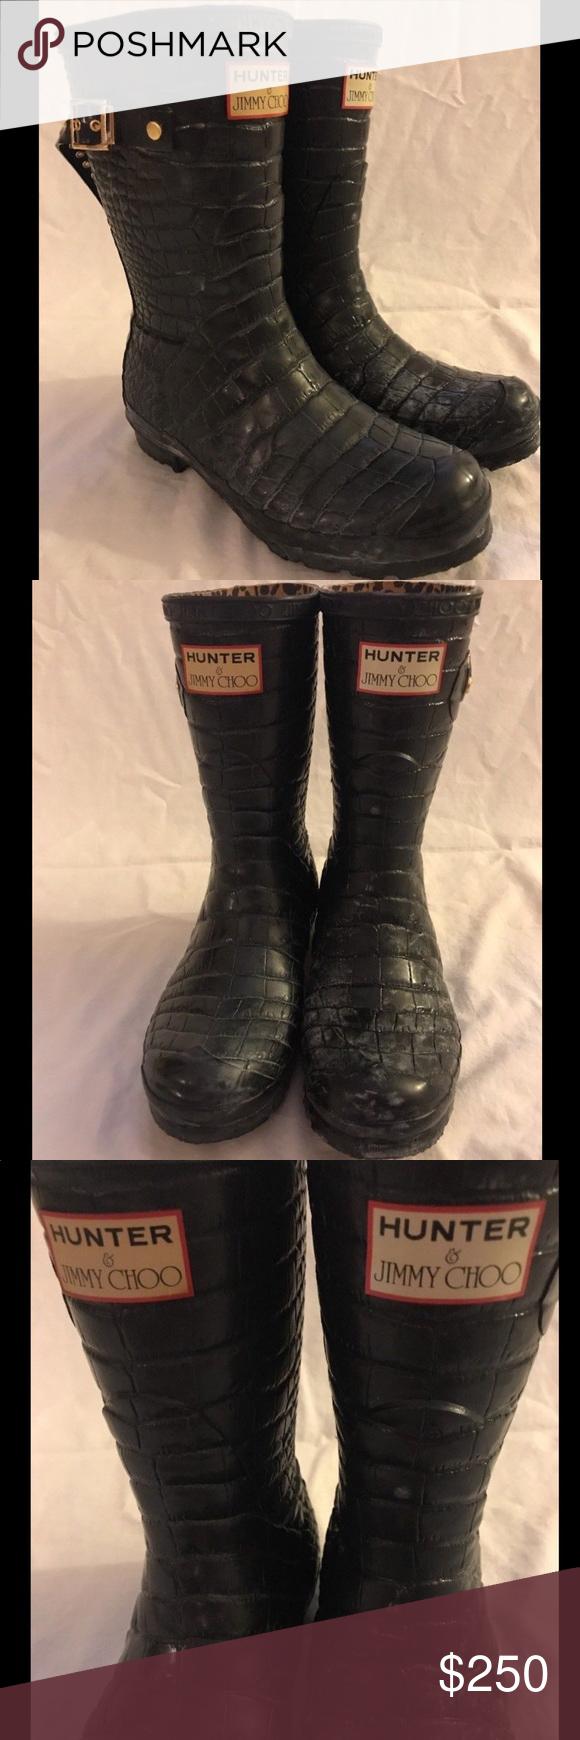 d20317959a9 Hunter x Jimmy choo embossed croc boots wellies Hunter x Jimmy Choo  collaboration boots — Wellington boots